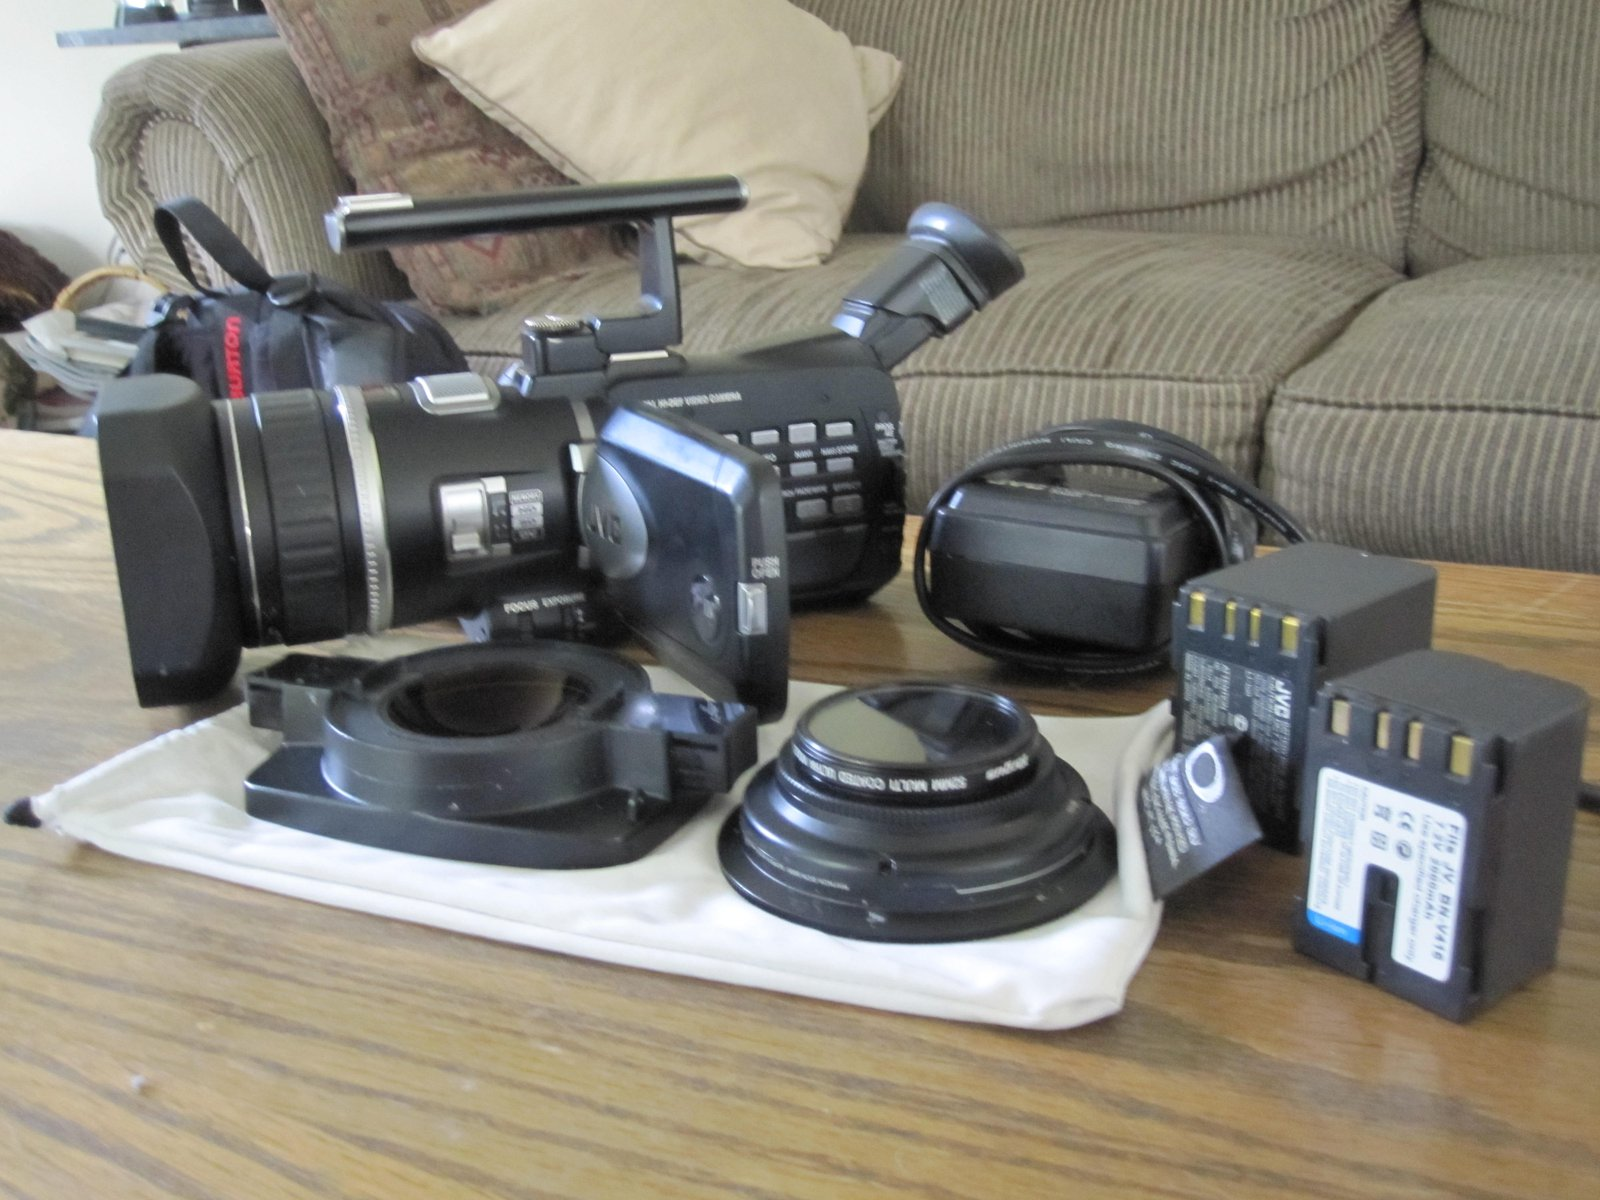 #11 camera set up